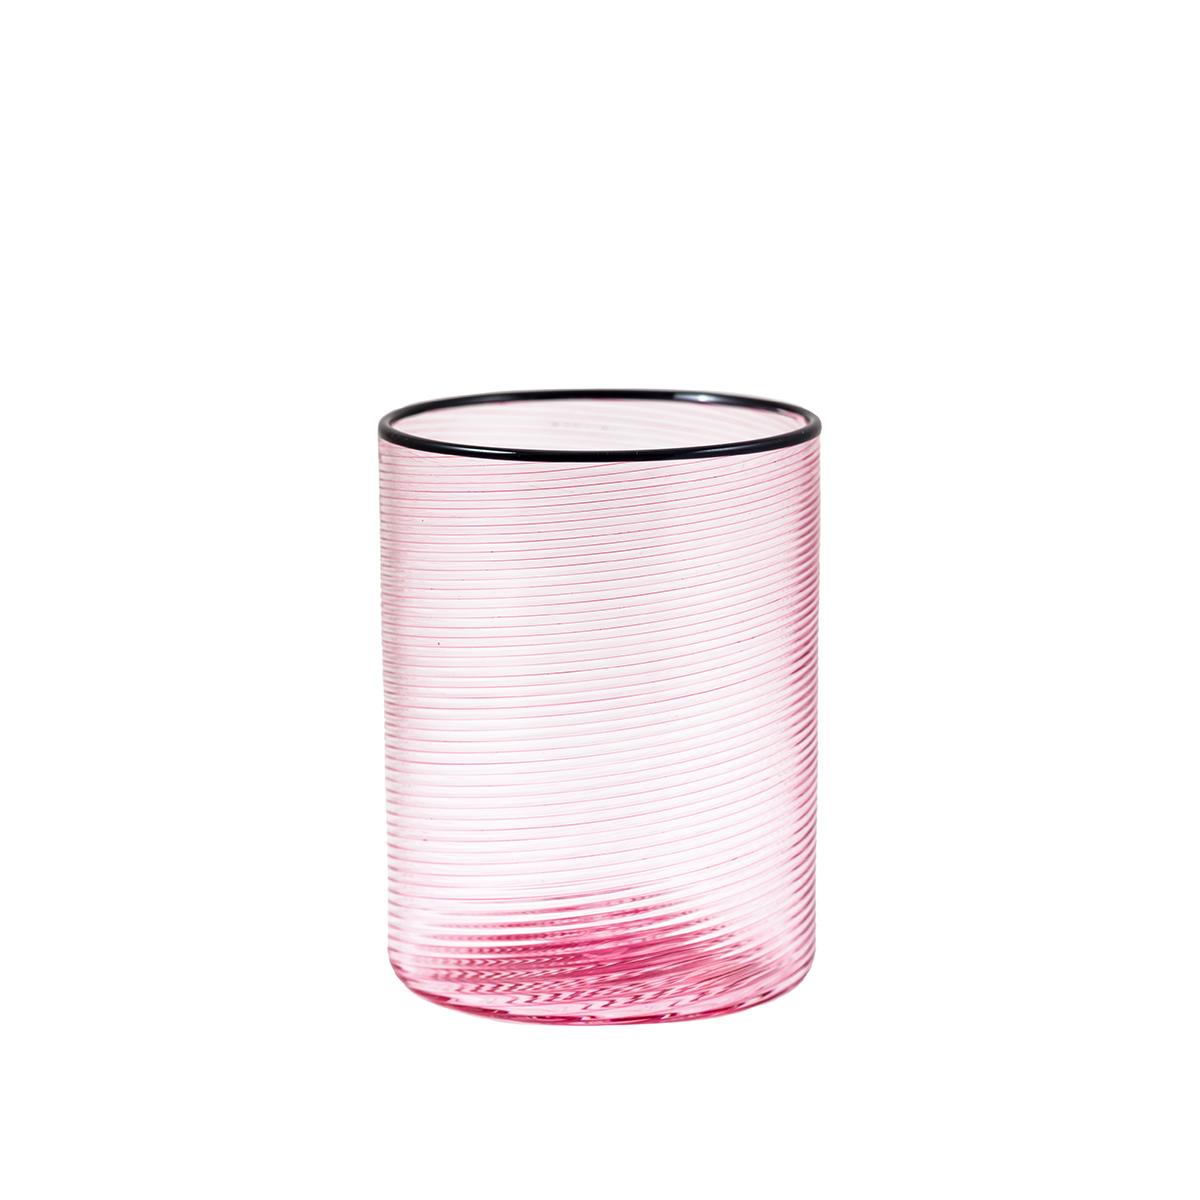 fizzy_glass_water_pink_murano_riga_mena_handmade_venice_black_rim_design